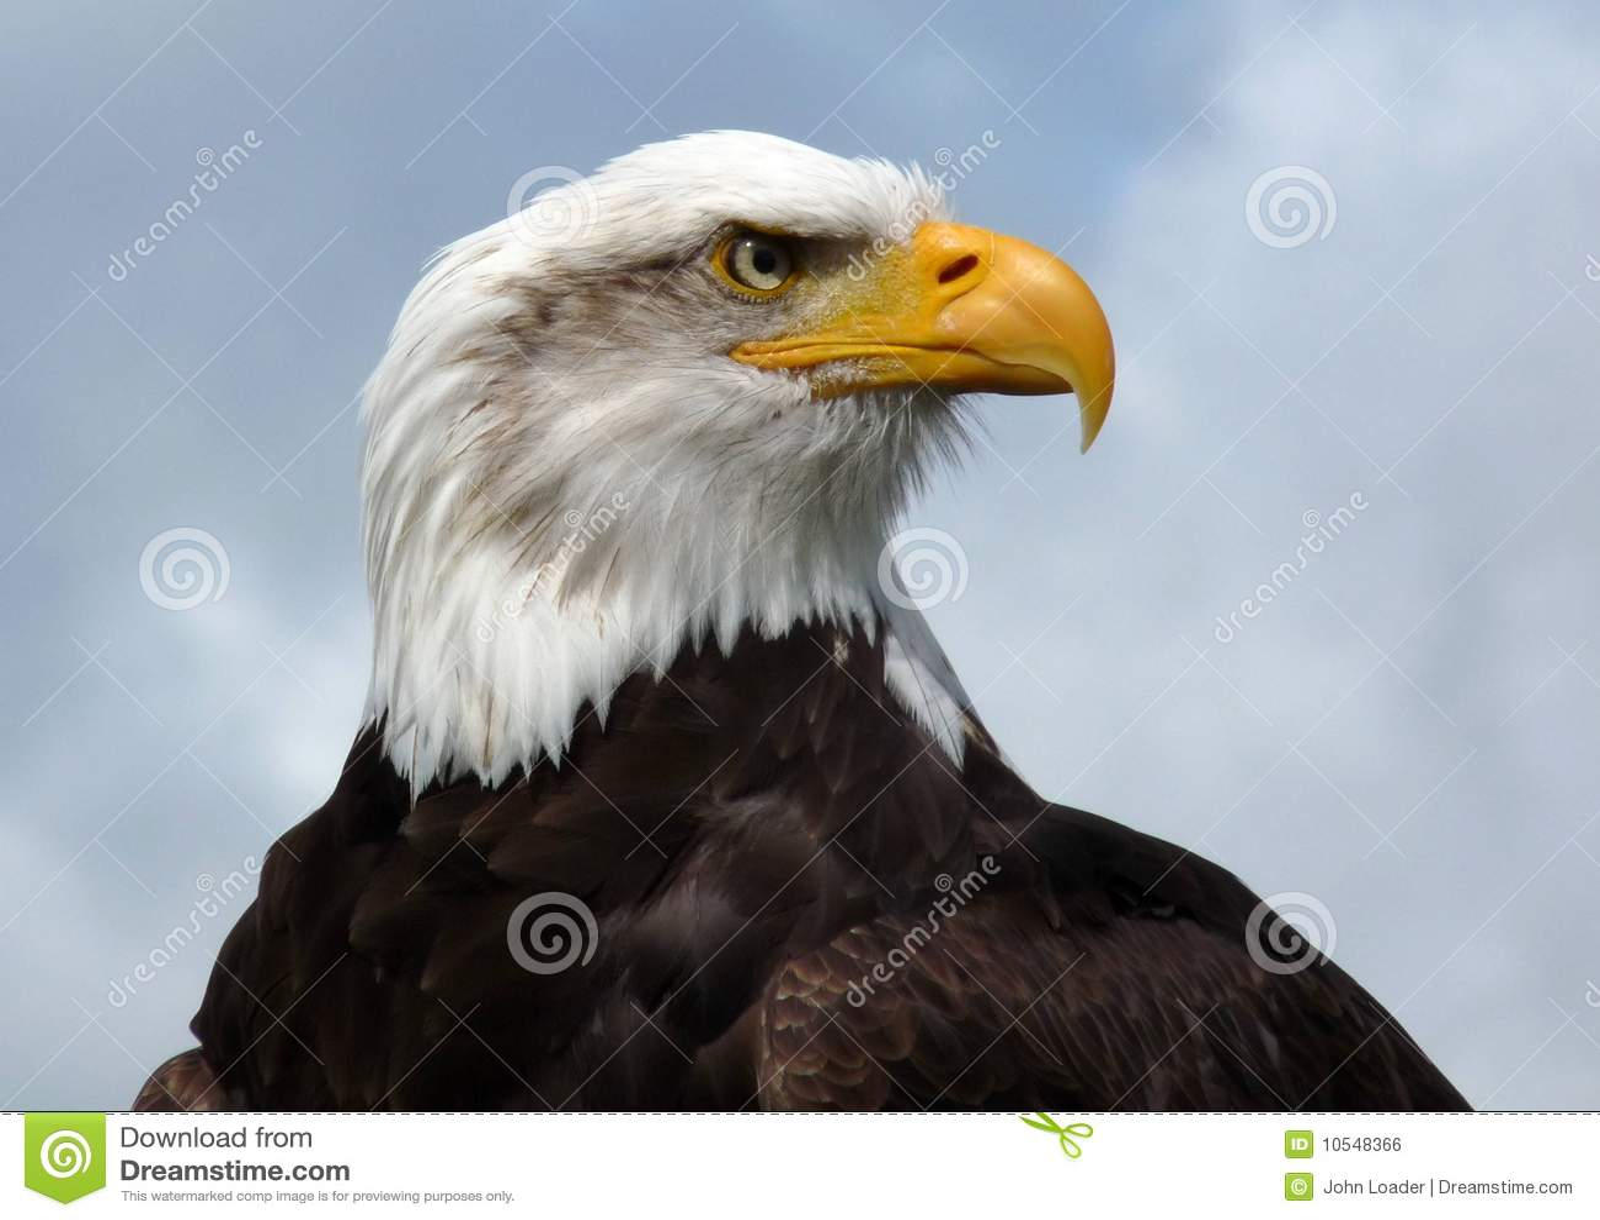 Bald eagle head front - photo#20